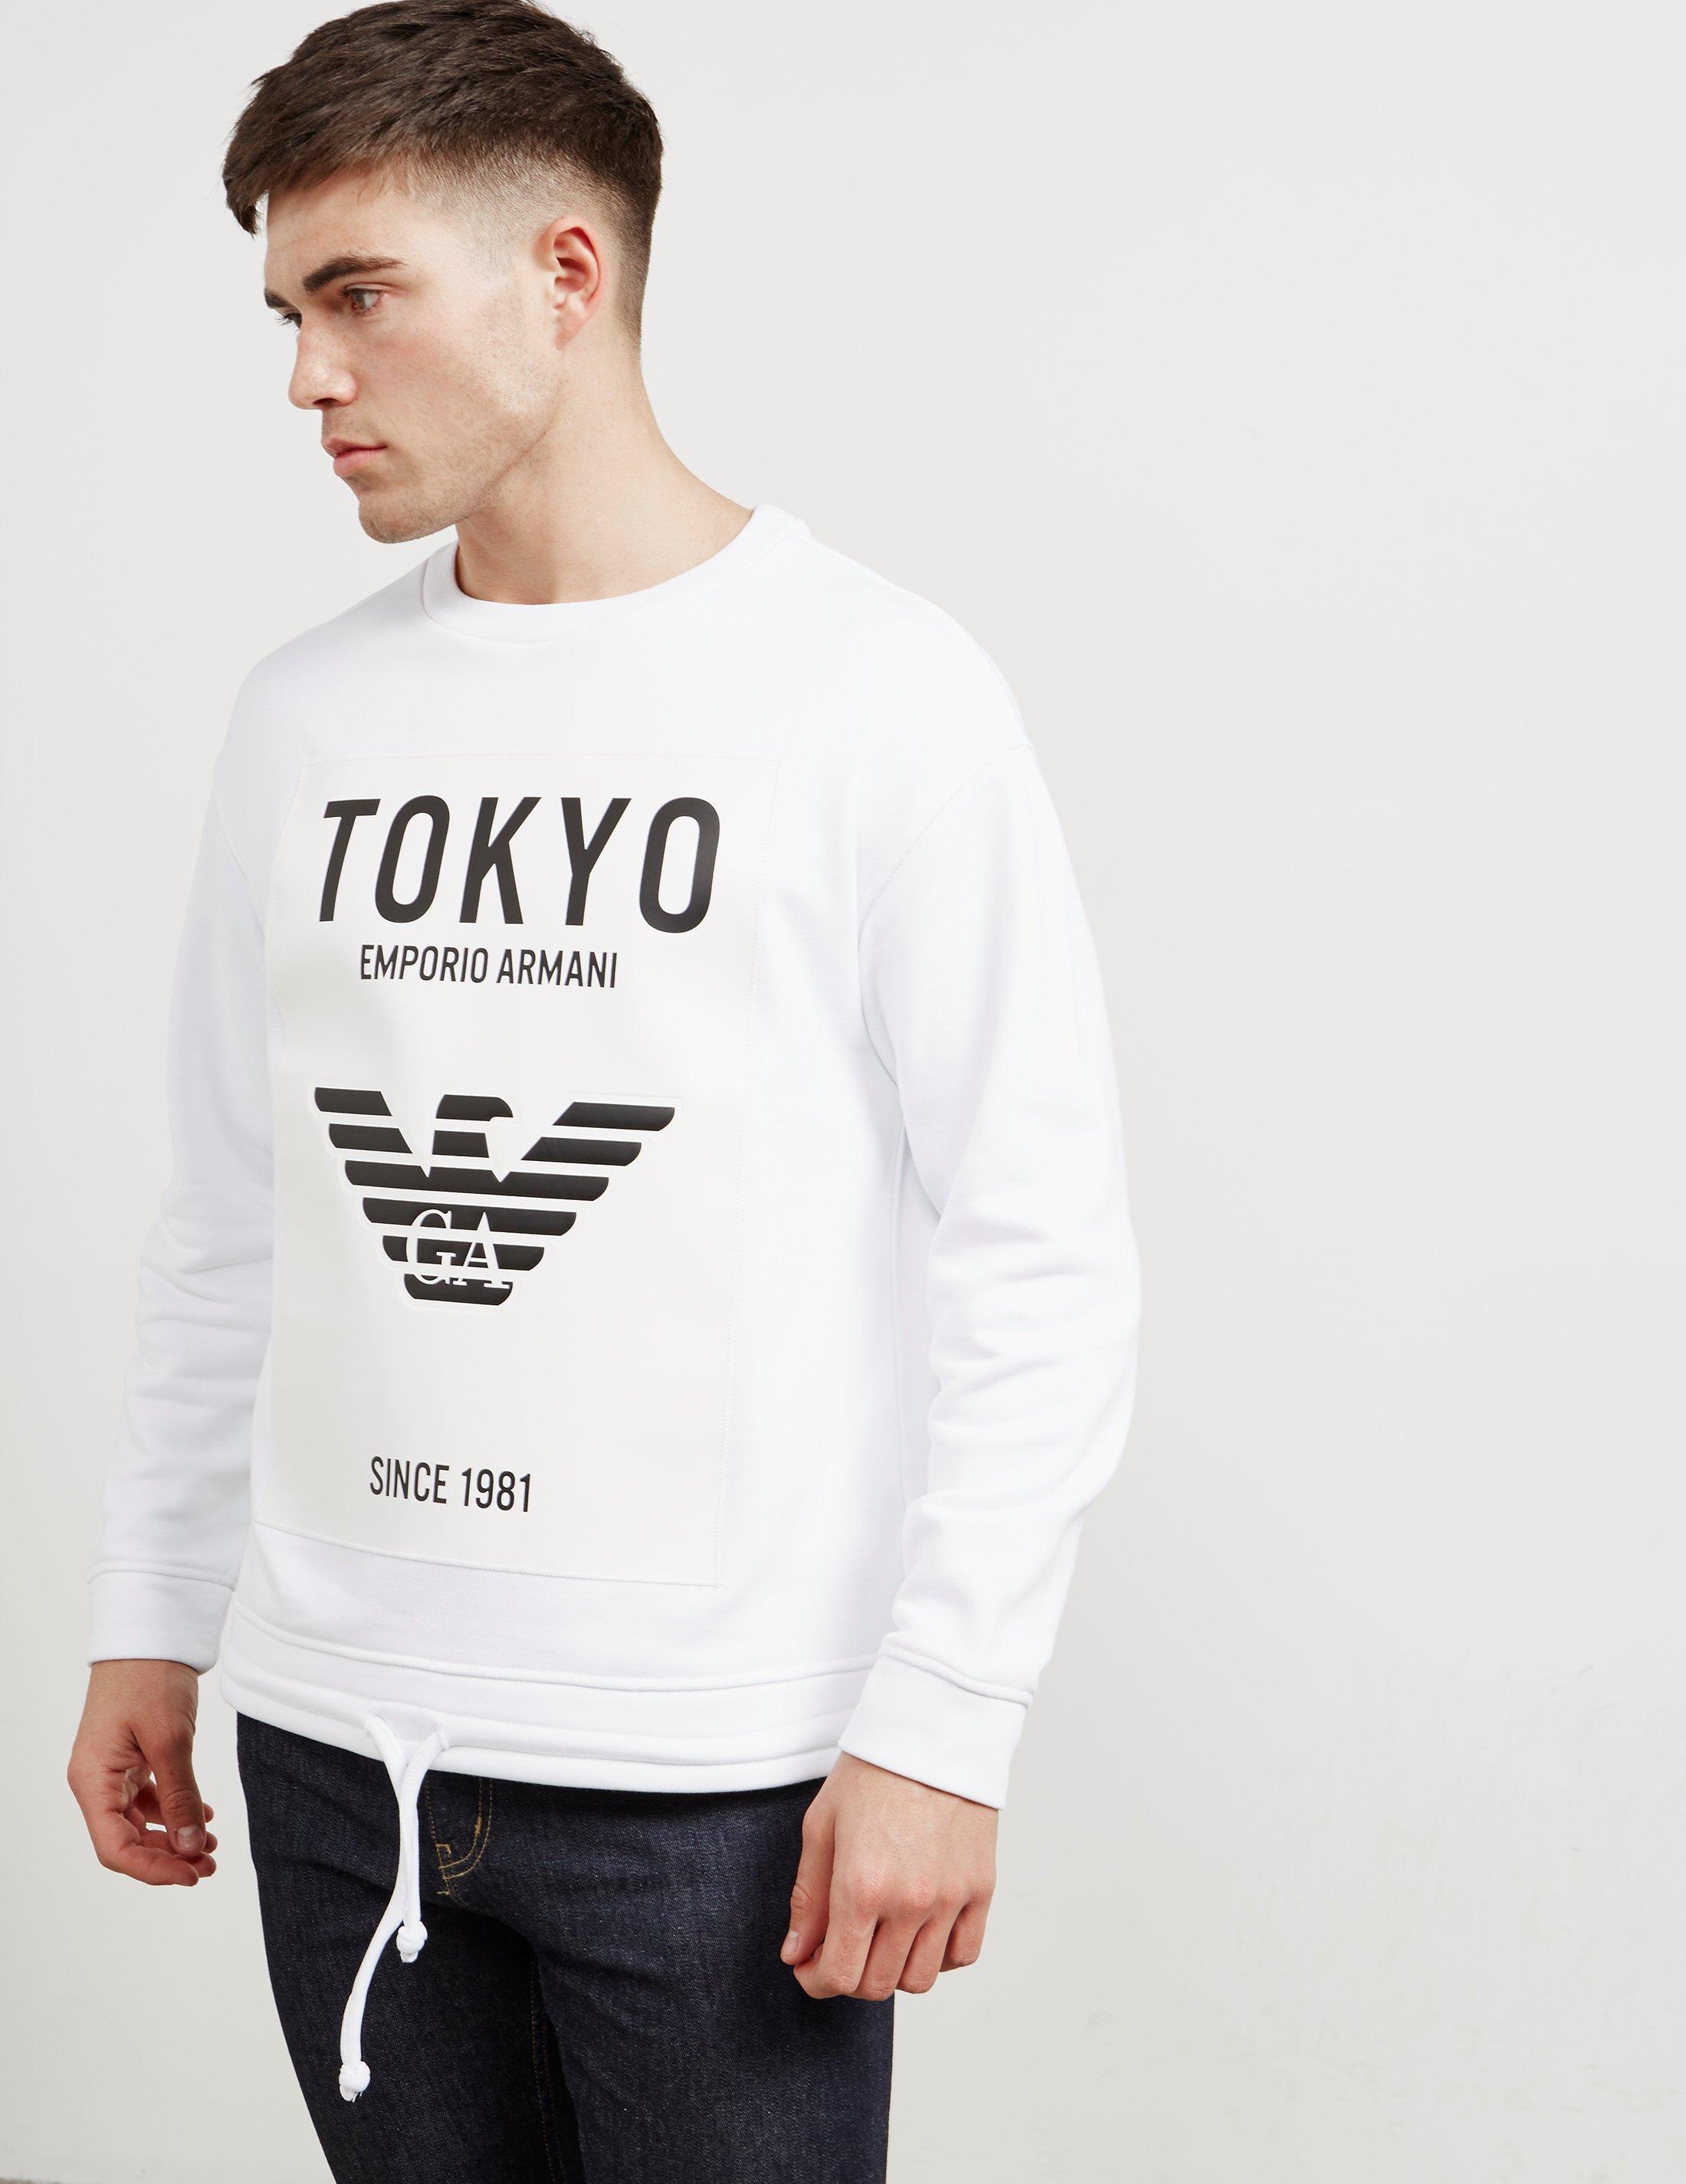 6960f836e6827 Emporio Armani Mens Tokyo Sweatshirt - Online Exclusive White in ...